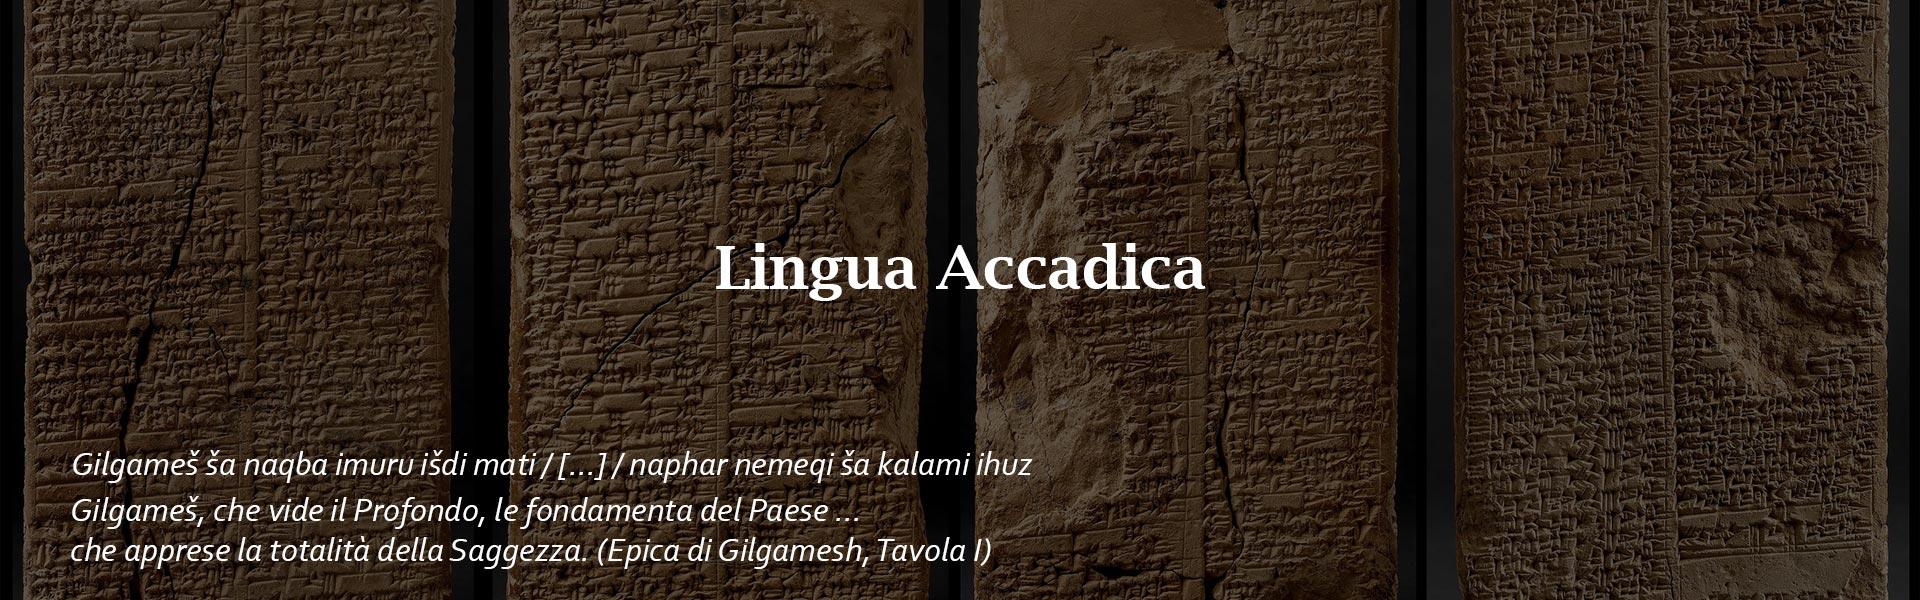 lingua-accadica--Alif